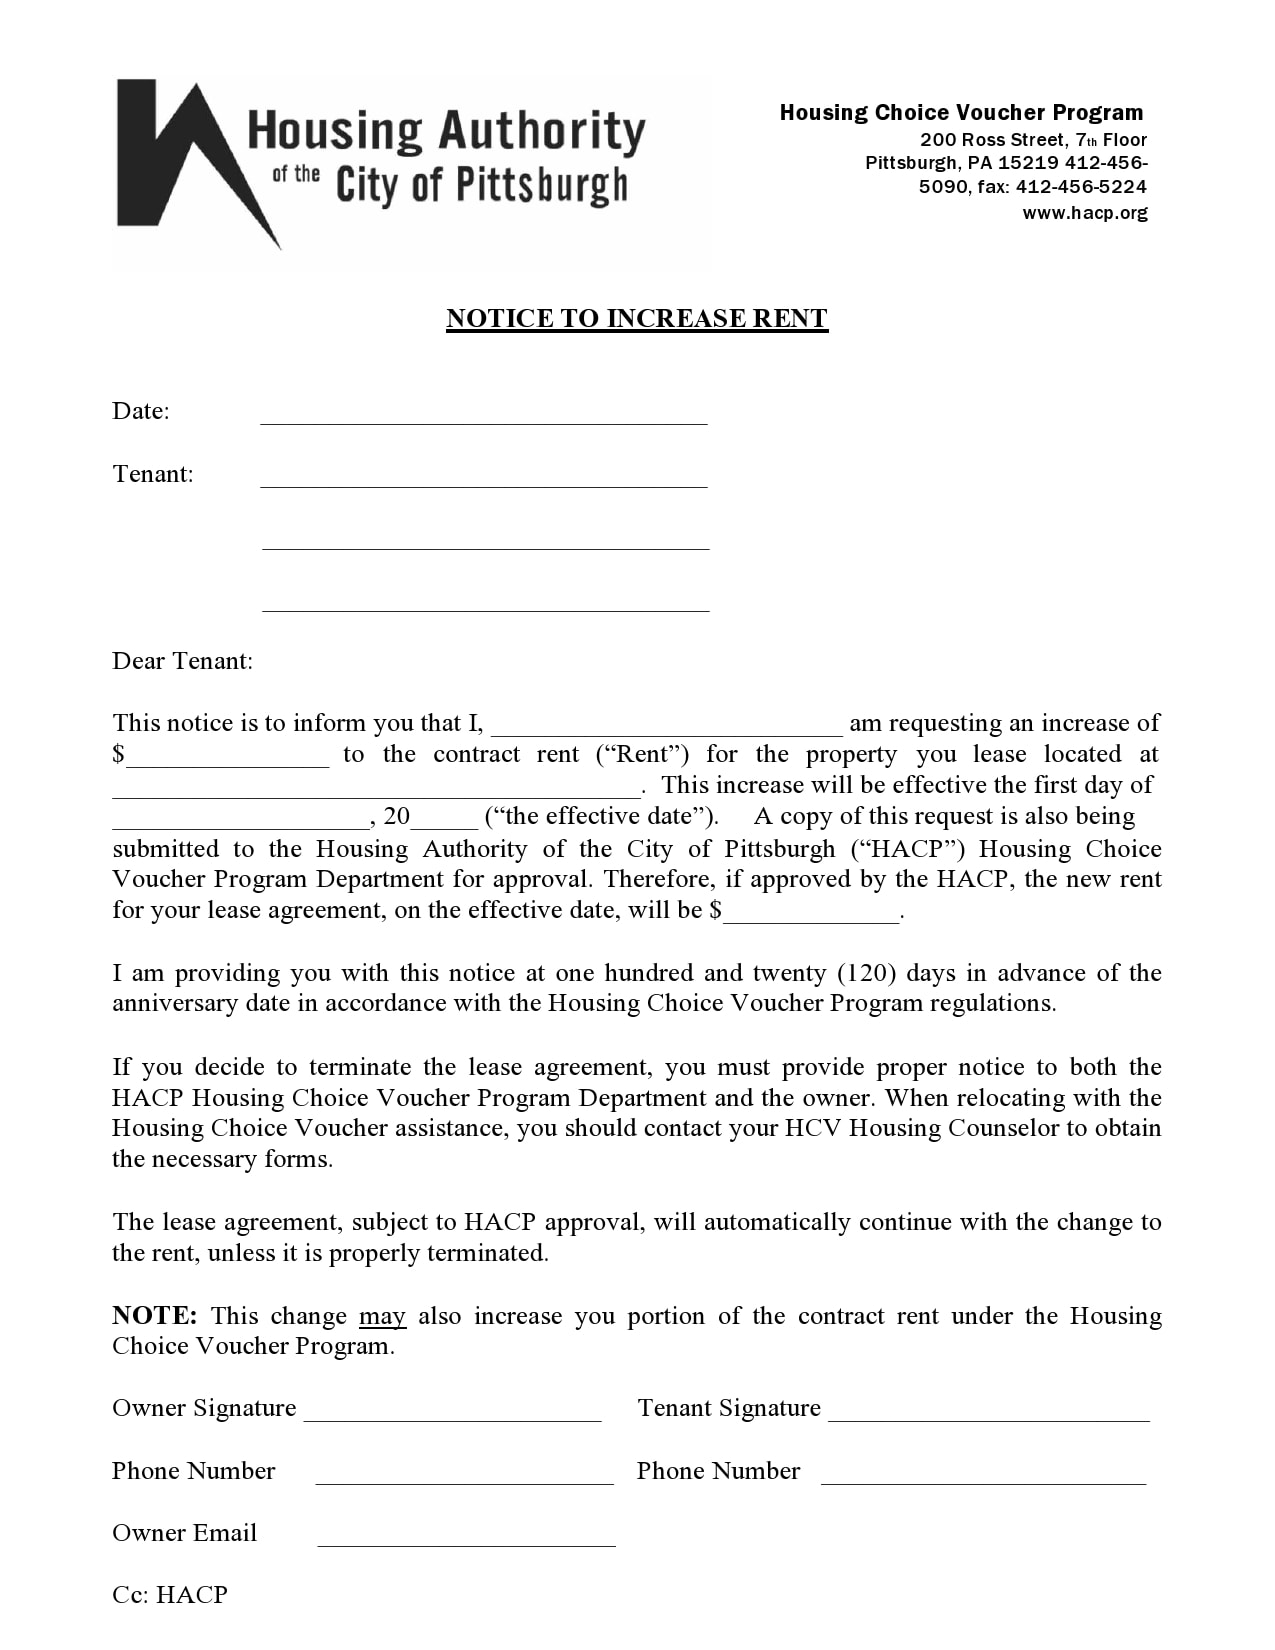 rent increase notice 23